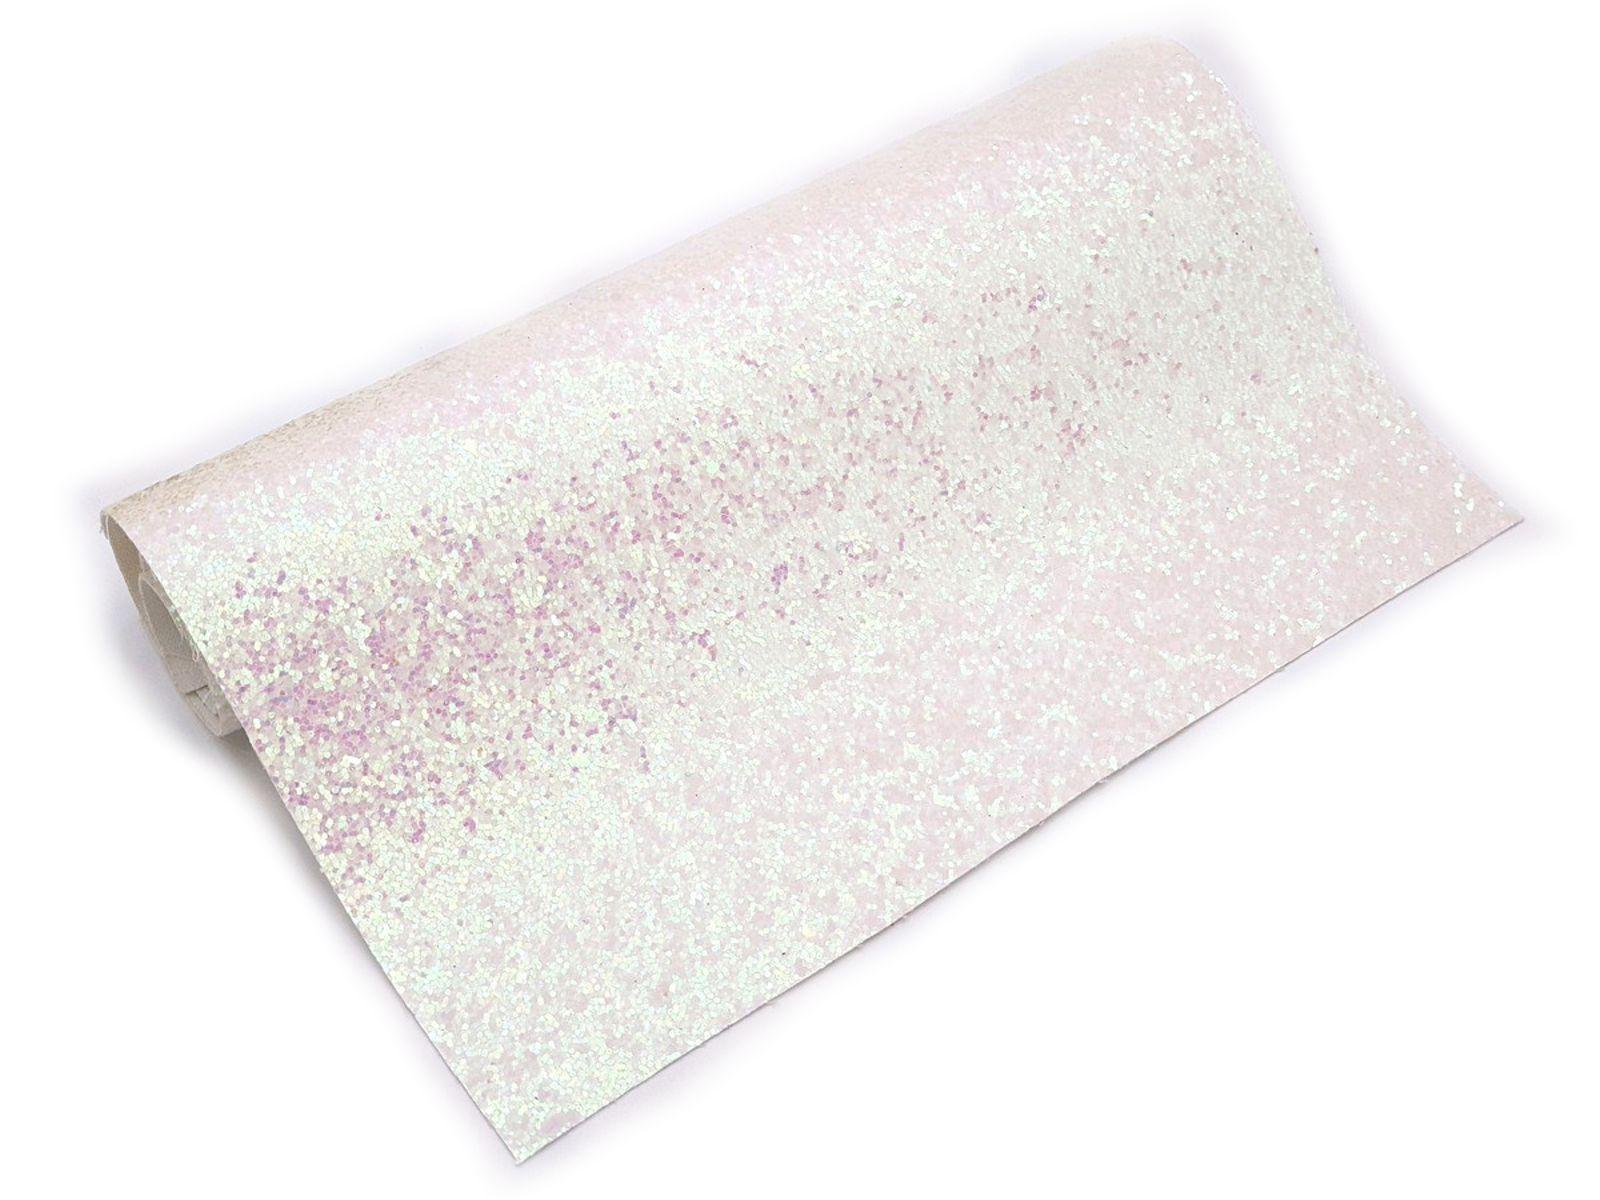 Lonita Glitter Branca - Furta Cor - Sublimação 25 Cm